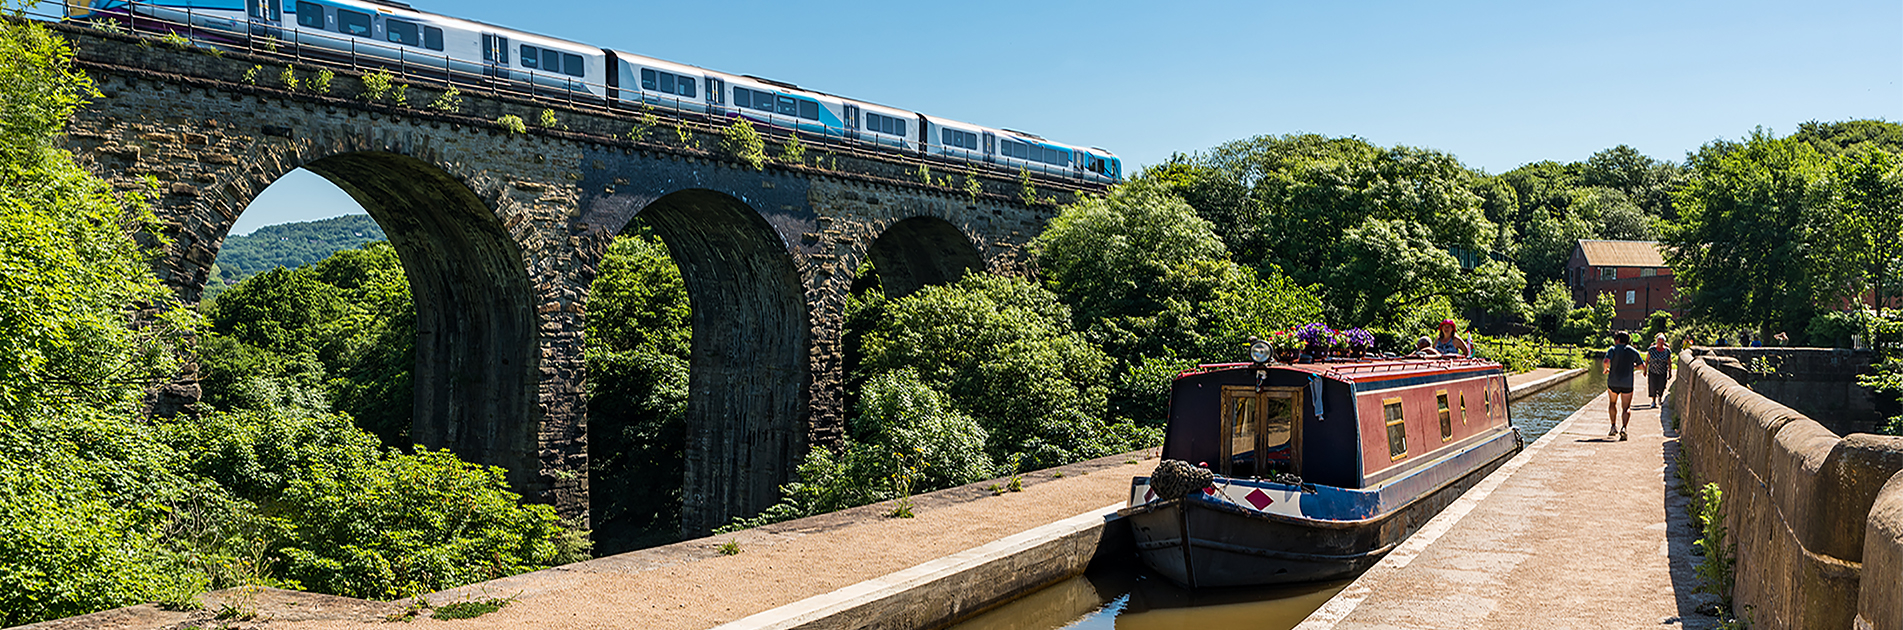 bridge and aqueduct in the Manchester-area